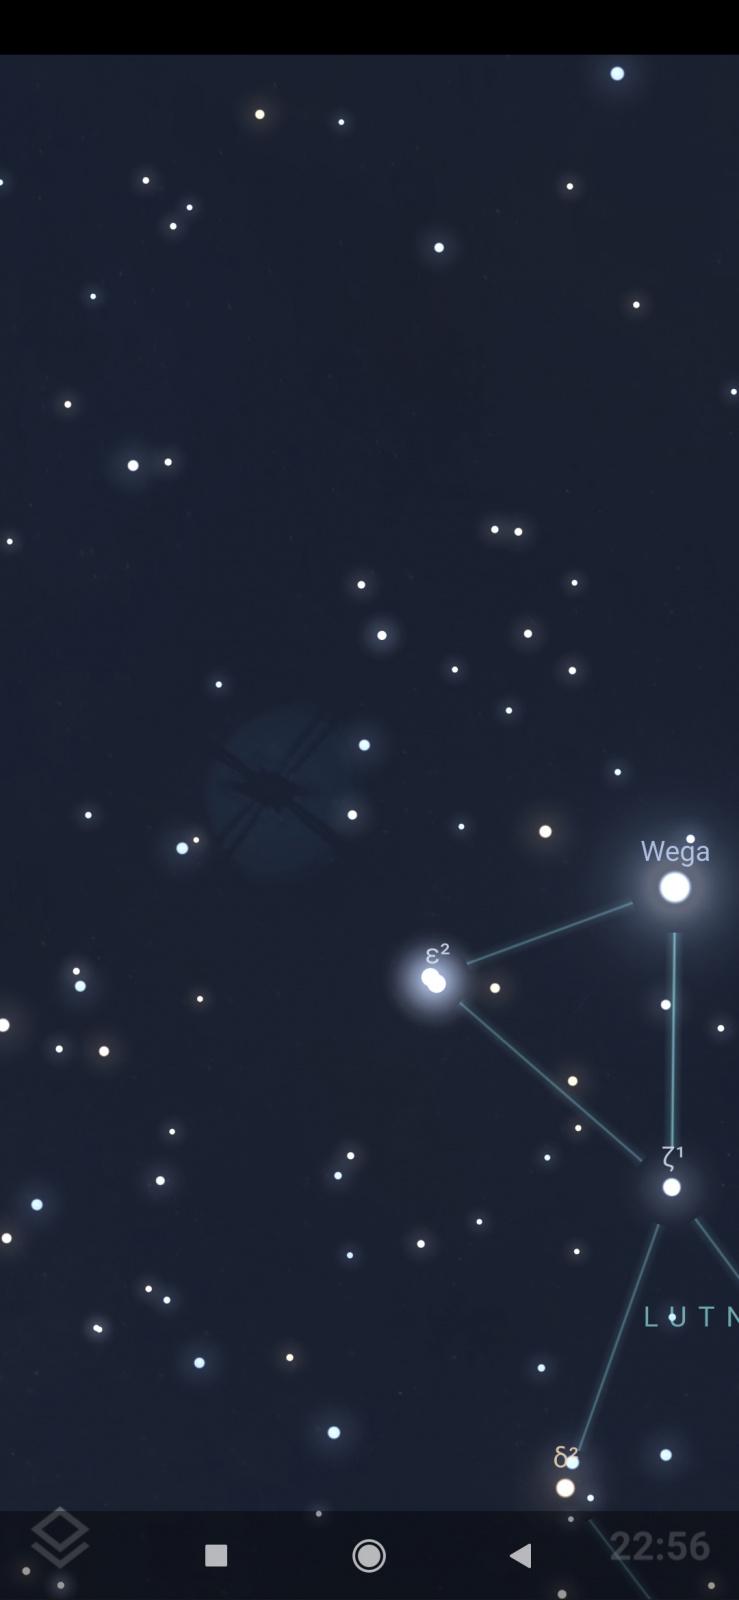 Screenshot_2020-07-05-22-56-35-791_com.noctuasoftware.stellarium_free.jpg